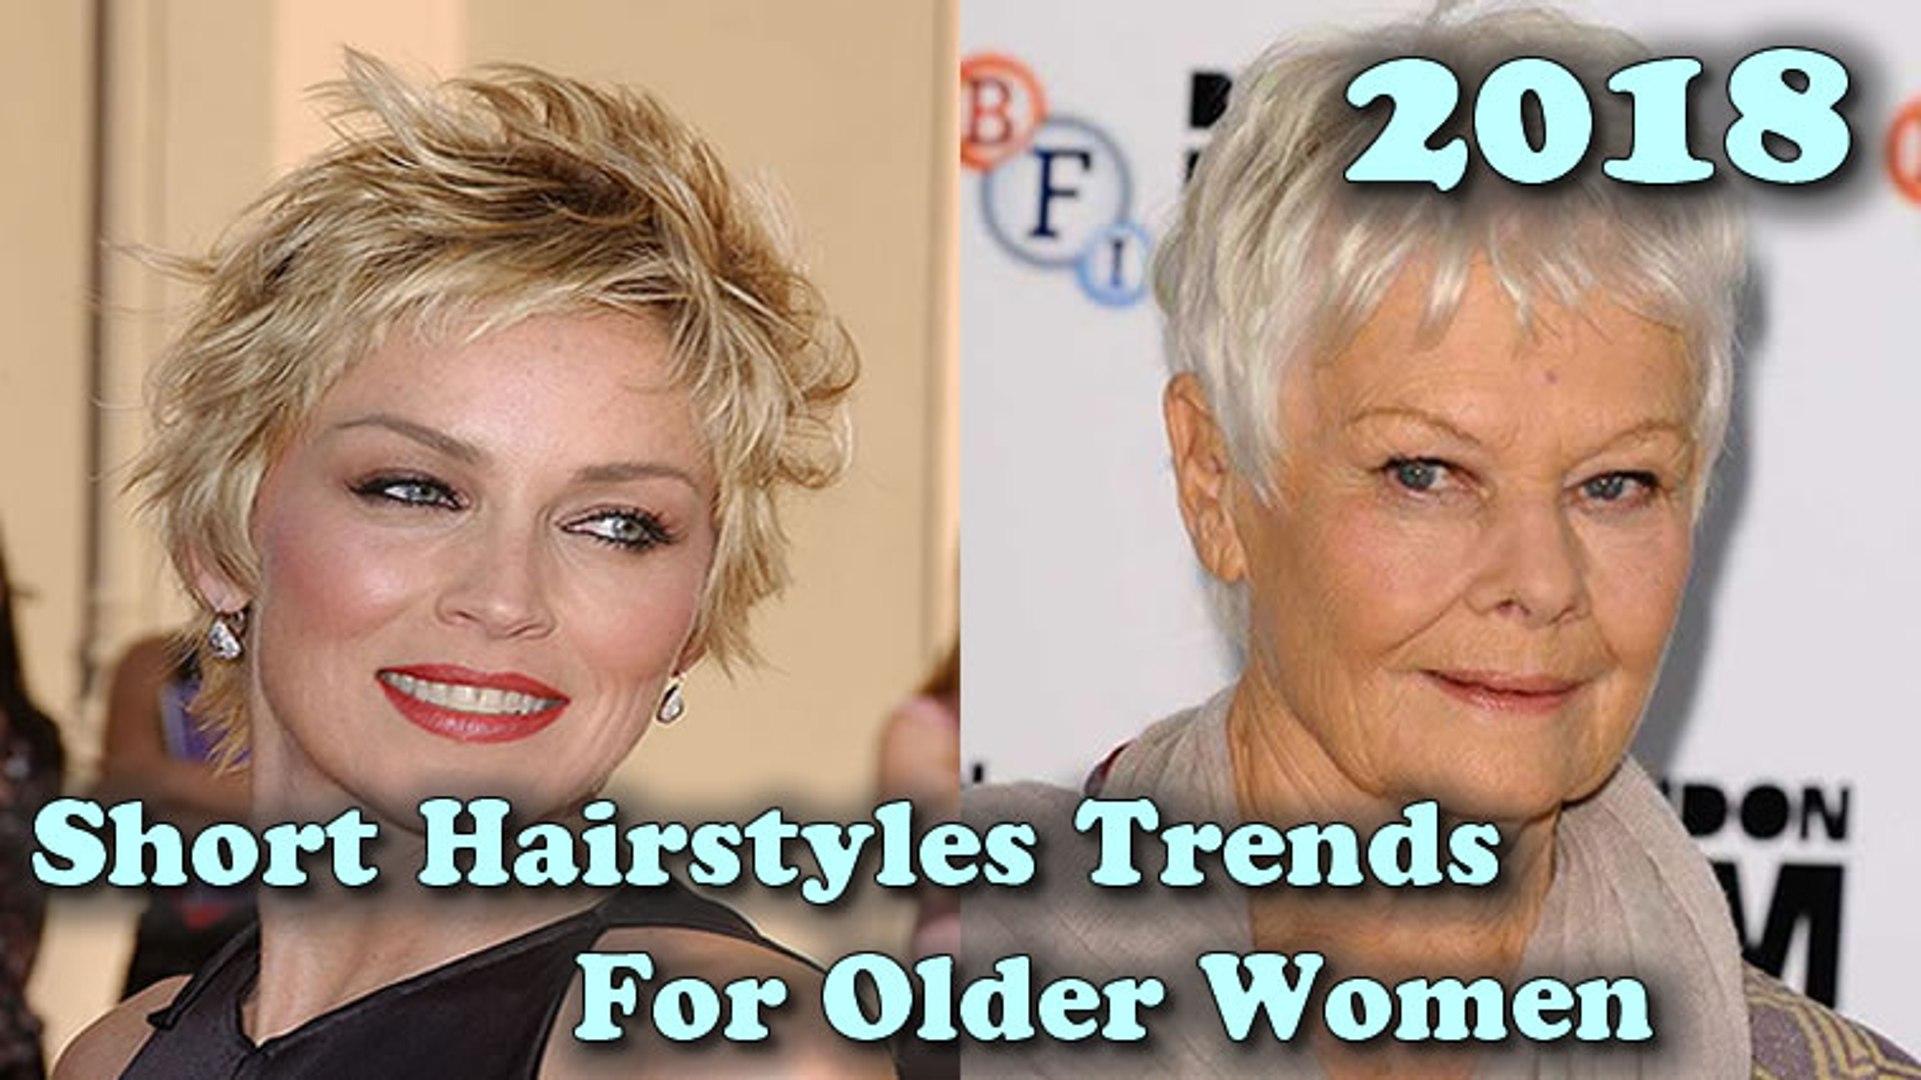 Short Hairstyles Trends For Older Women 2018